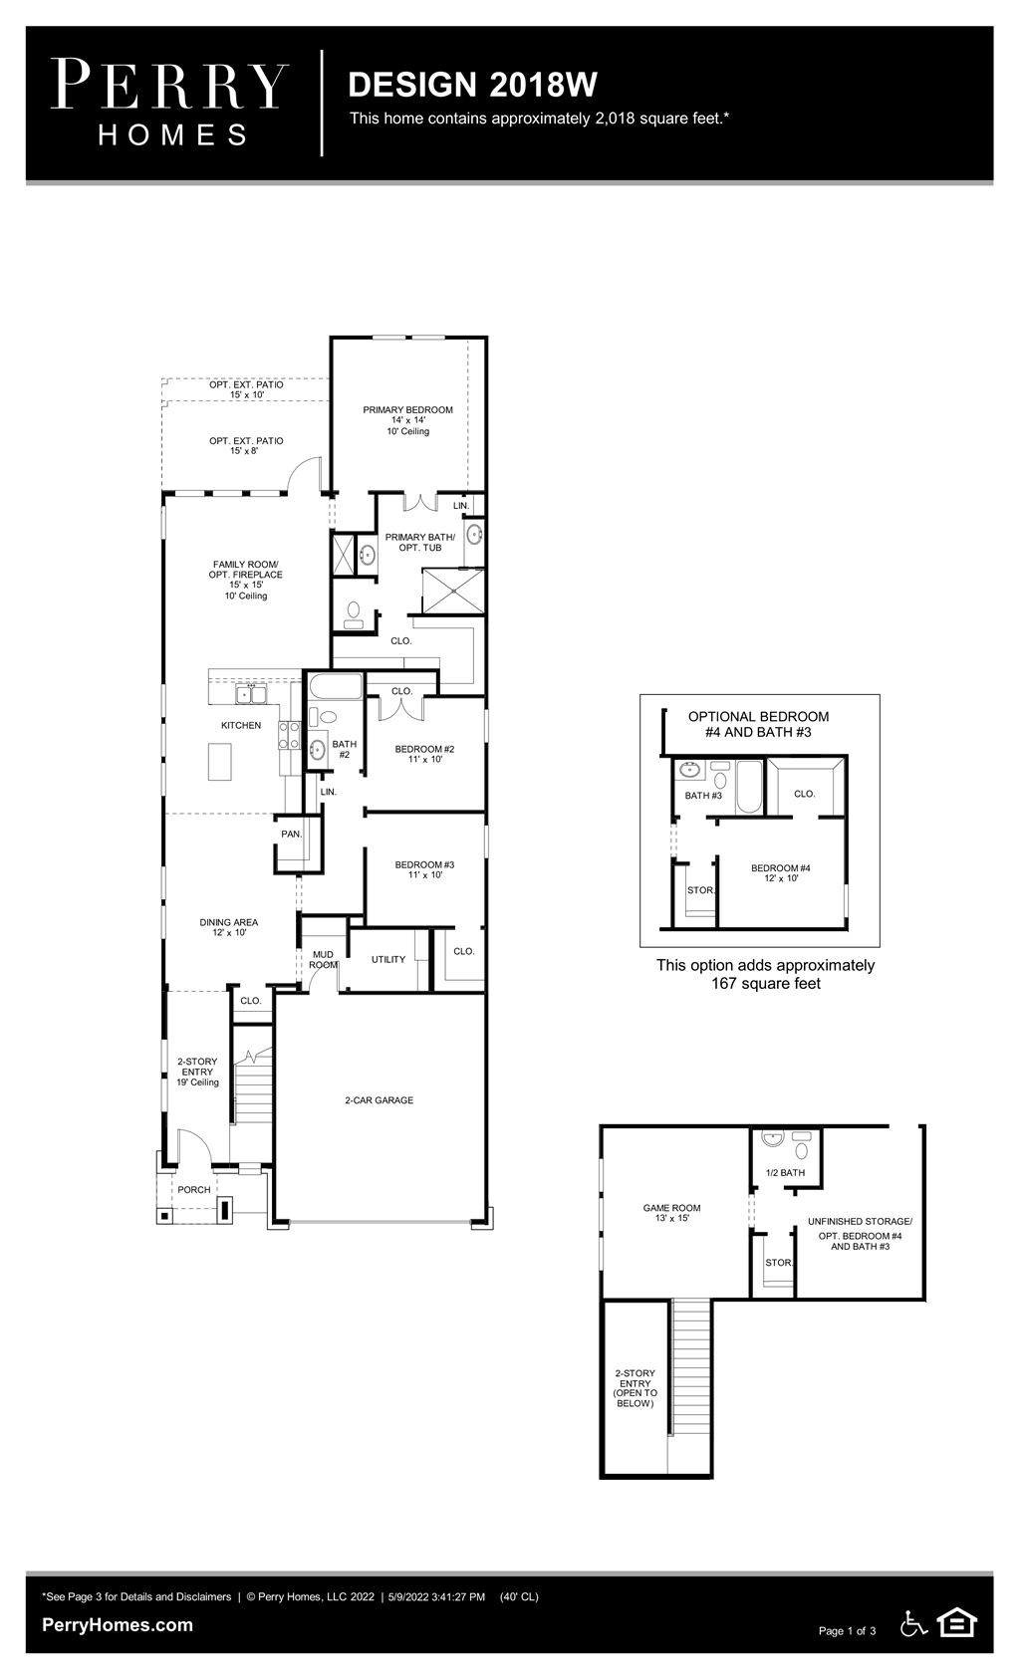 Floor Plan for 2018W